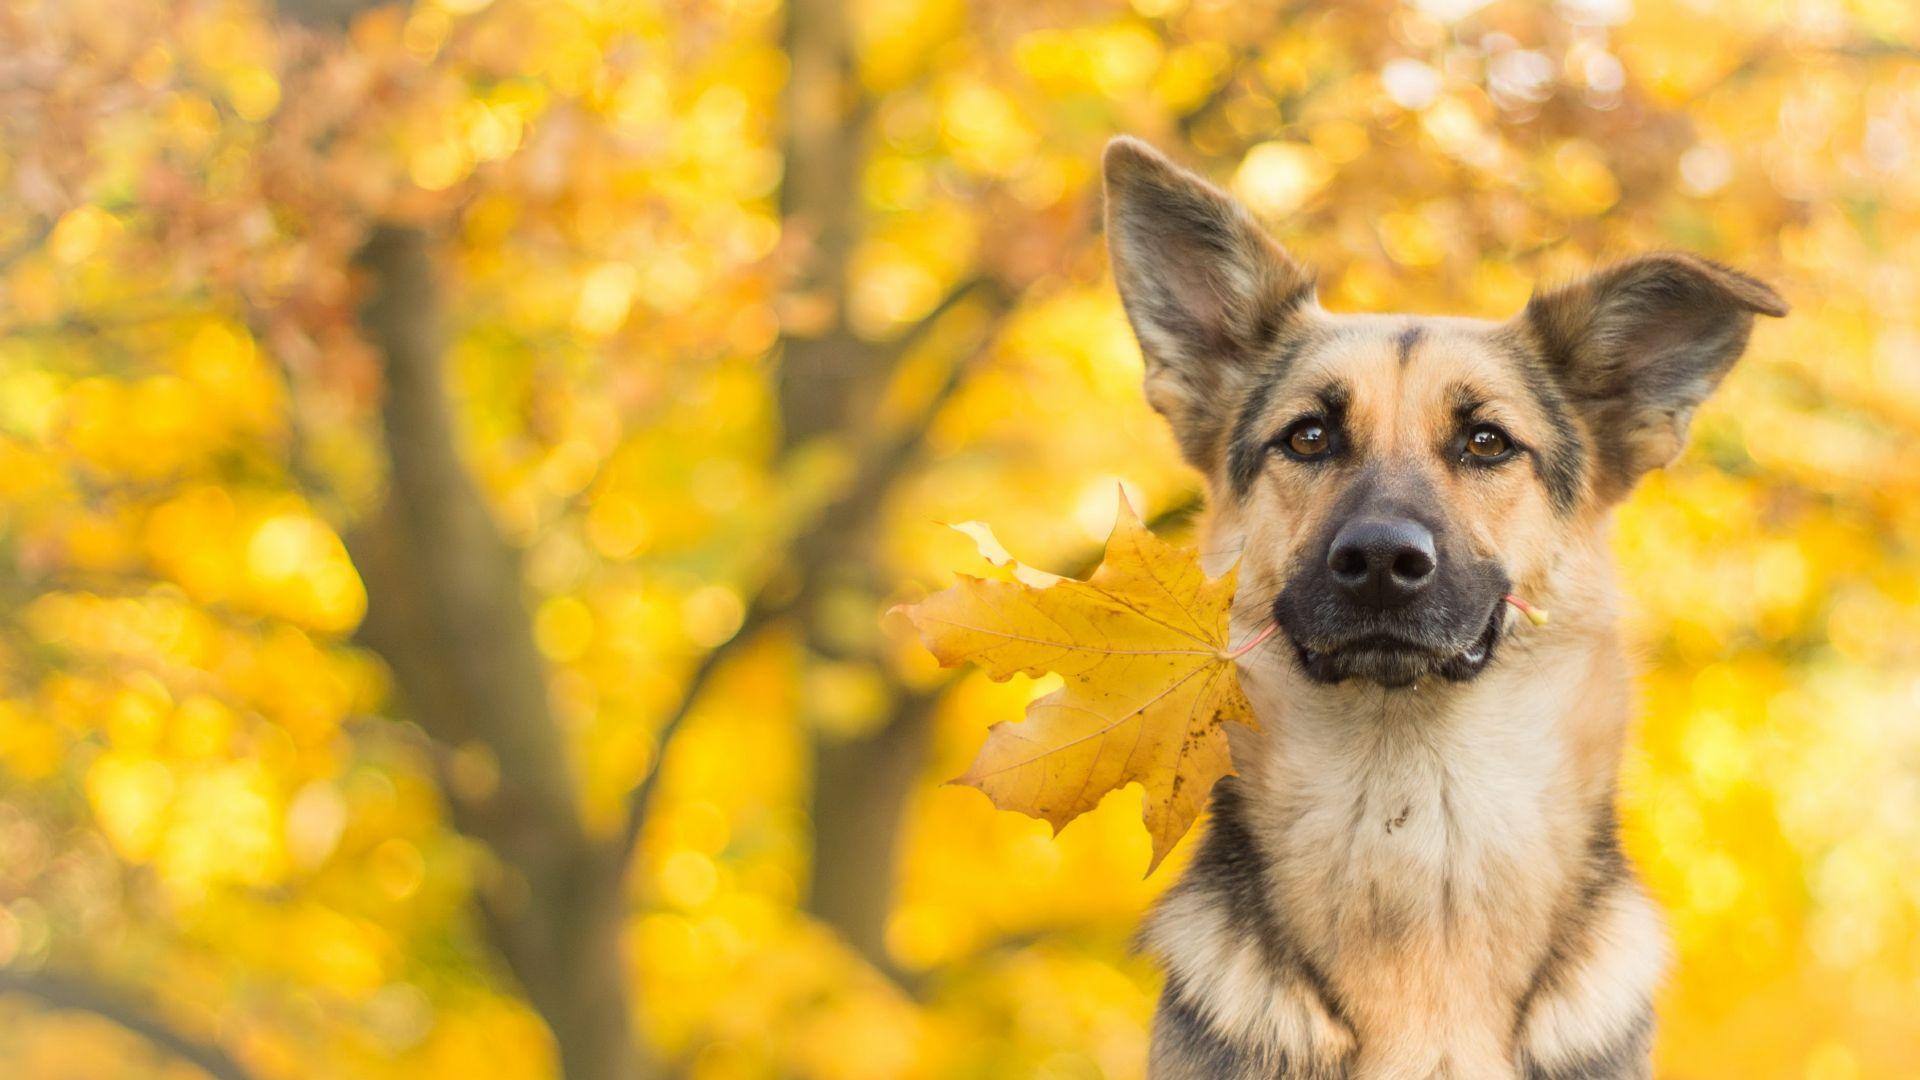 Fall Puppy Wallpaper Wallpaper Dog Cute Animals Leaves Autumn 4k Animals